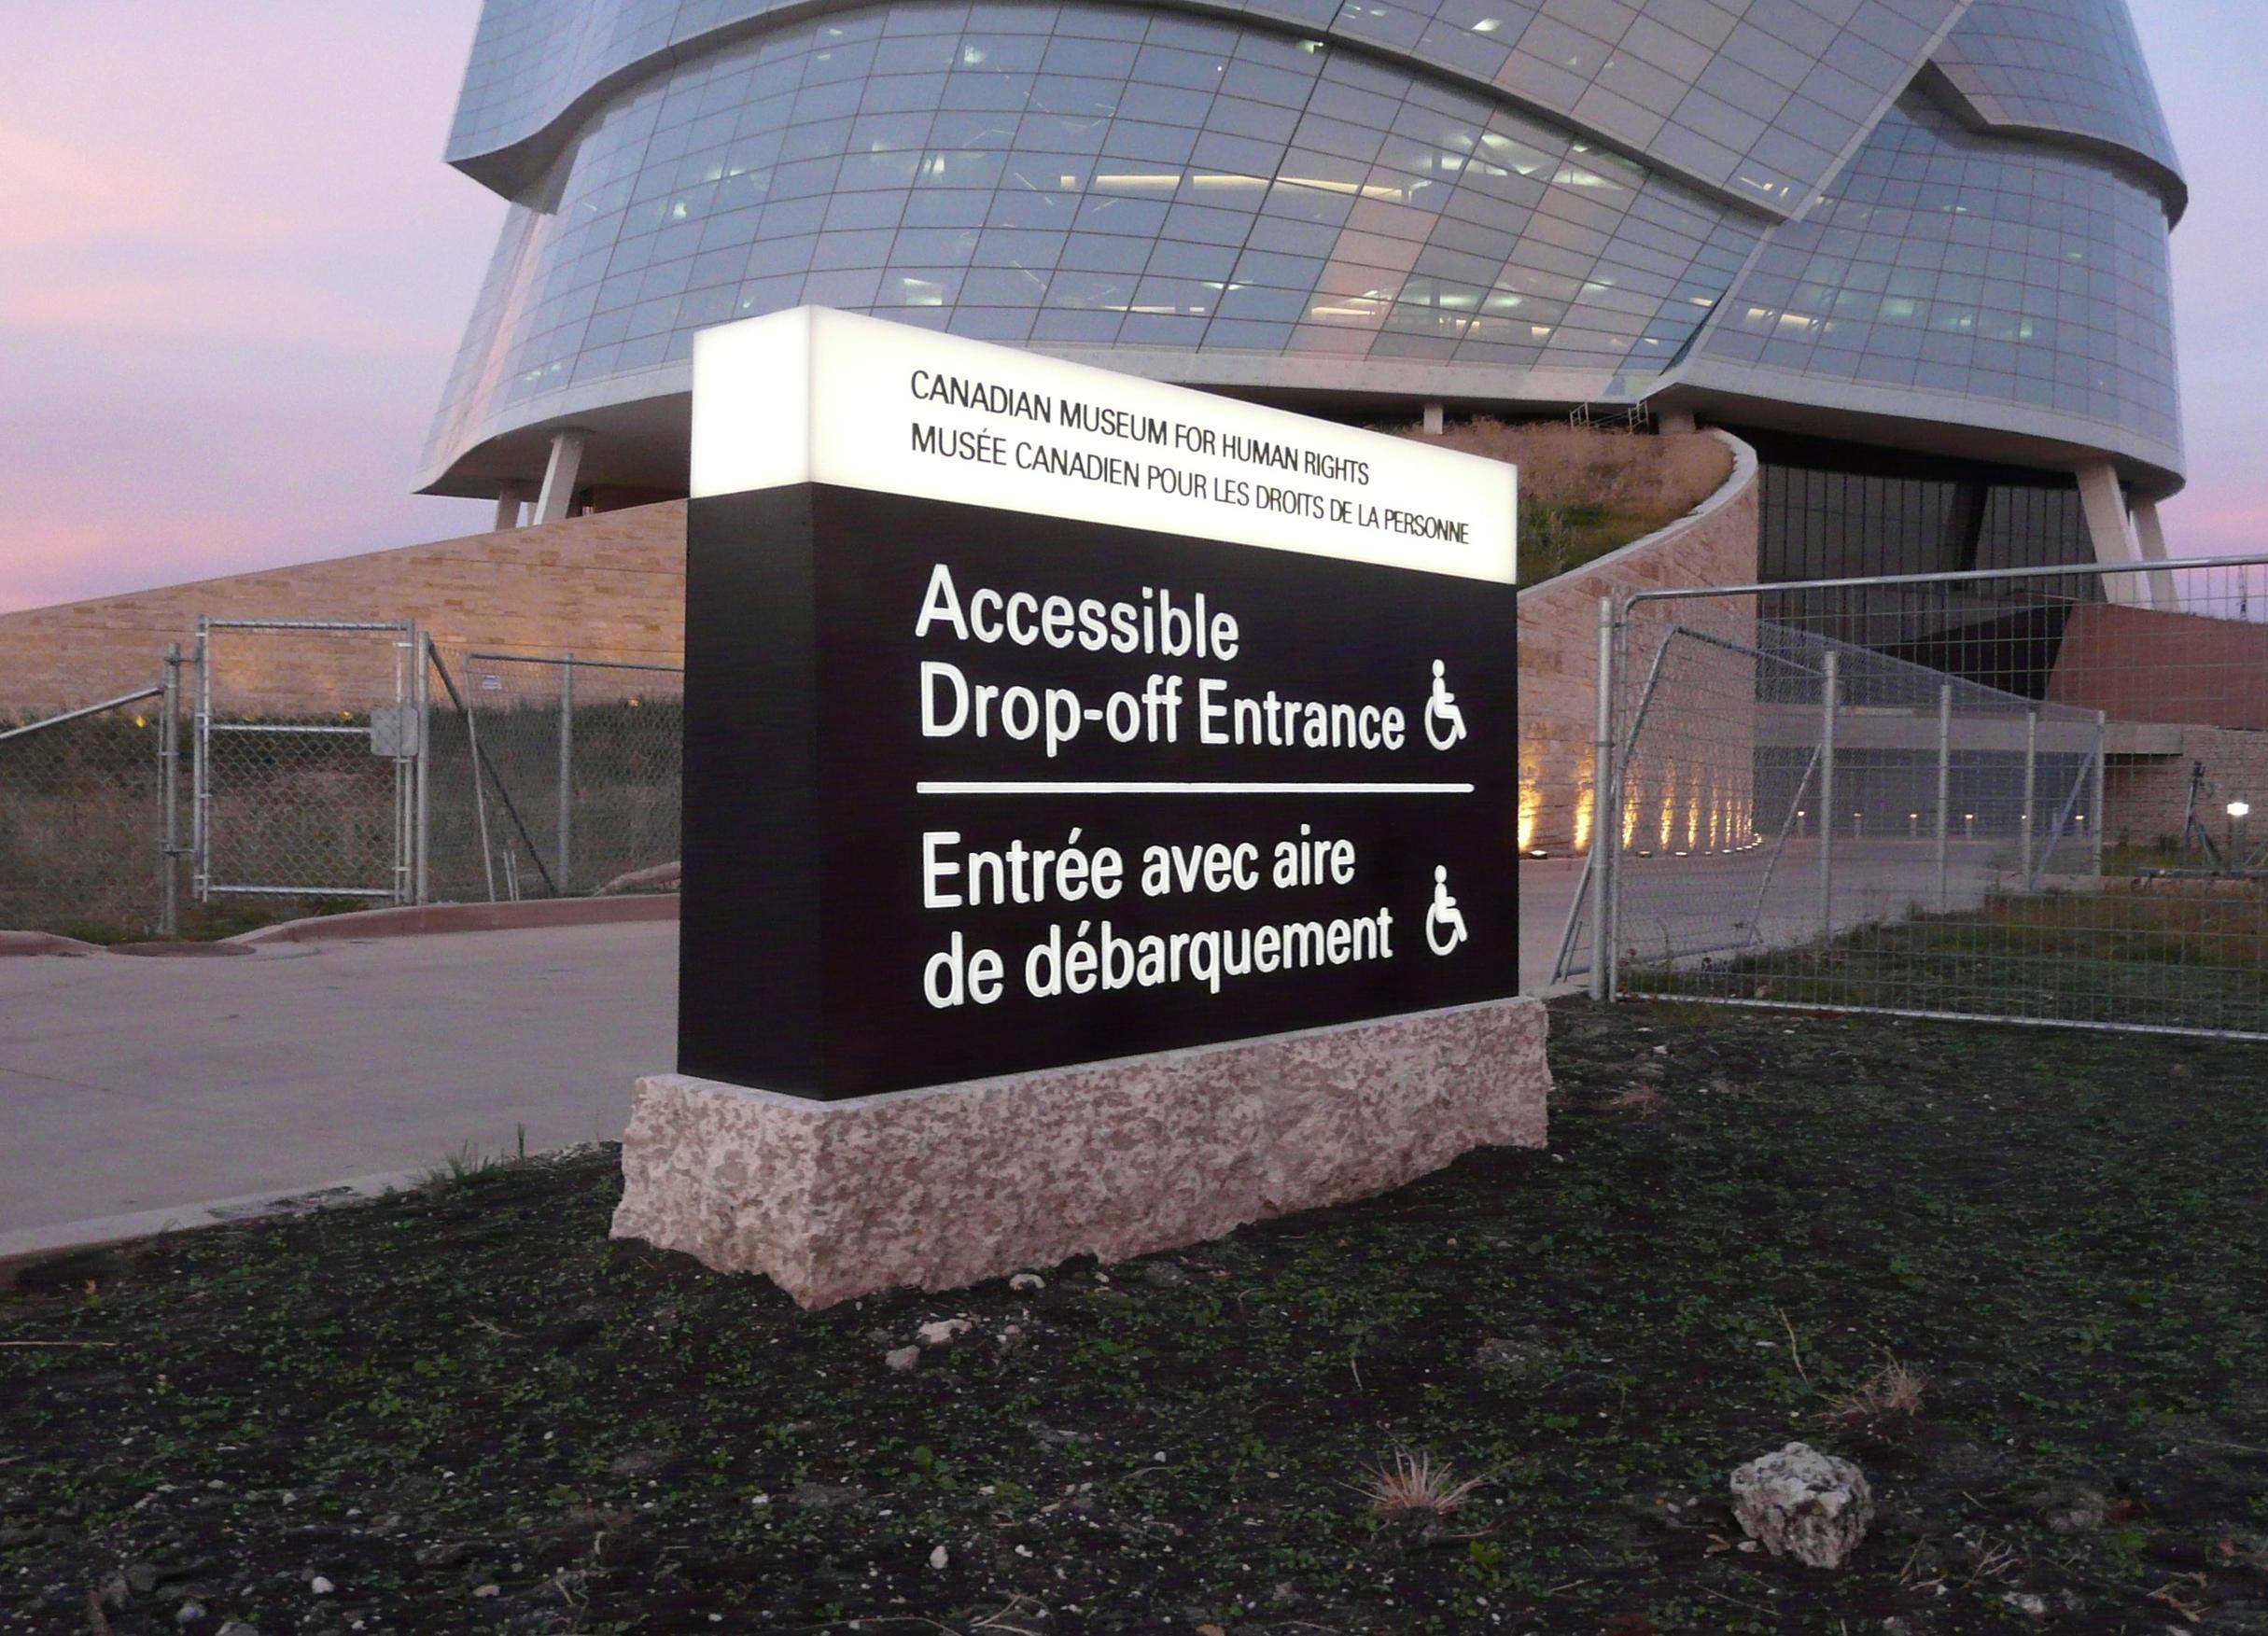 Architectural Signage & Wayfinding